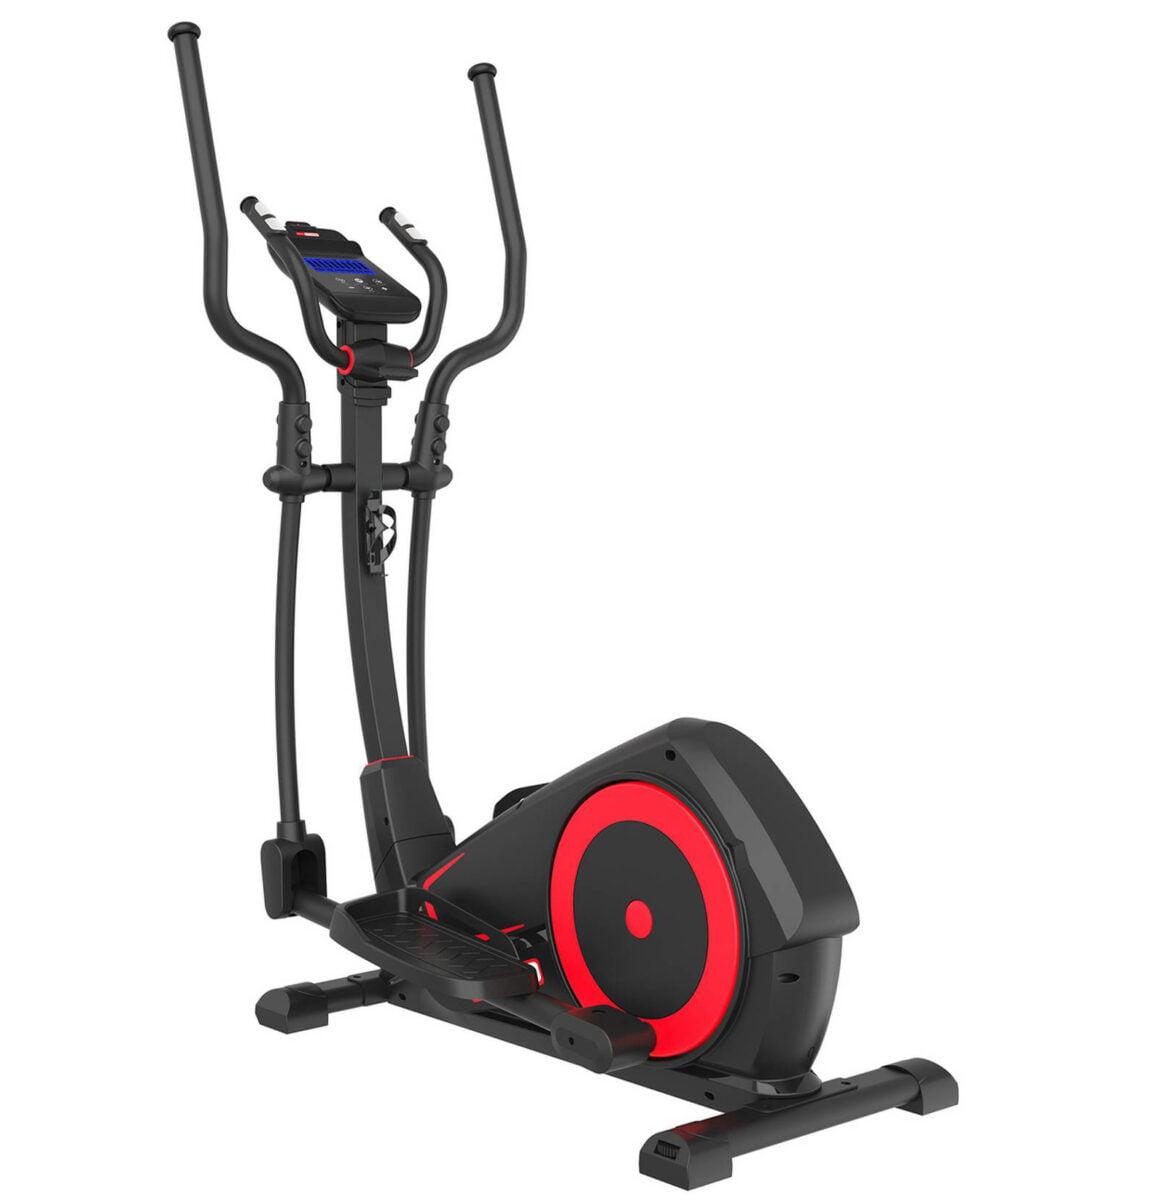 Pro Fitness XT2000 Cross Trainer Voucher Code